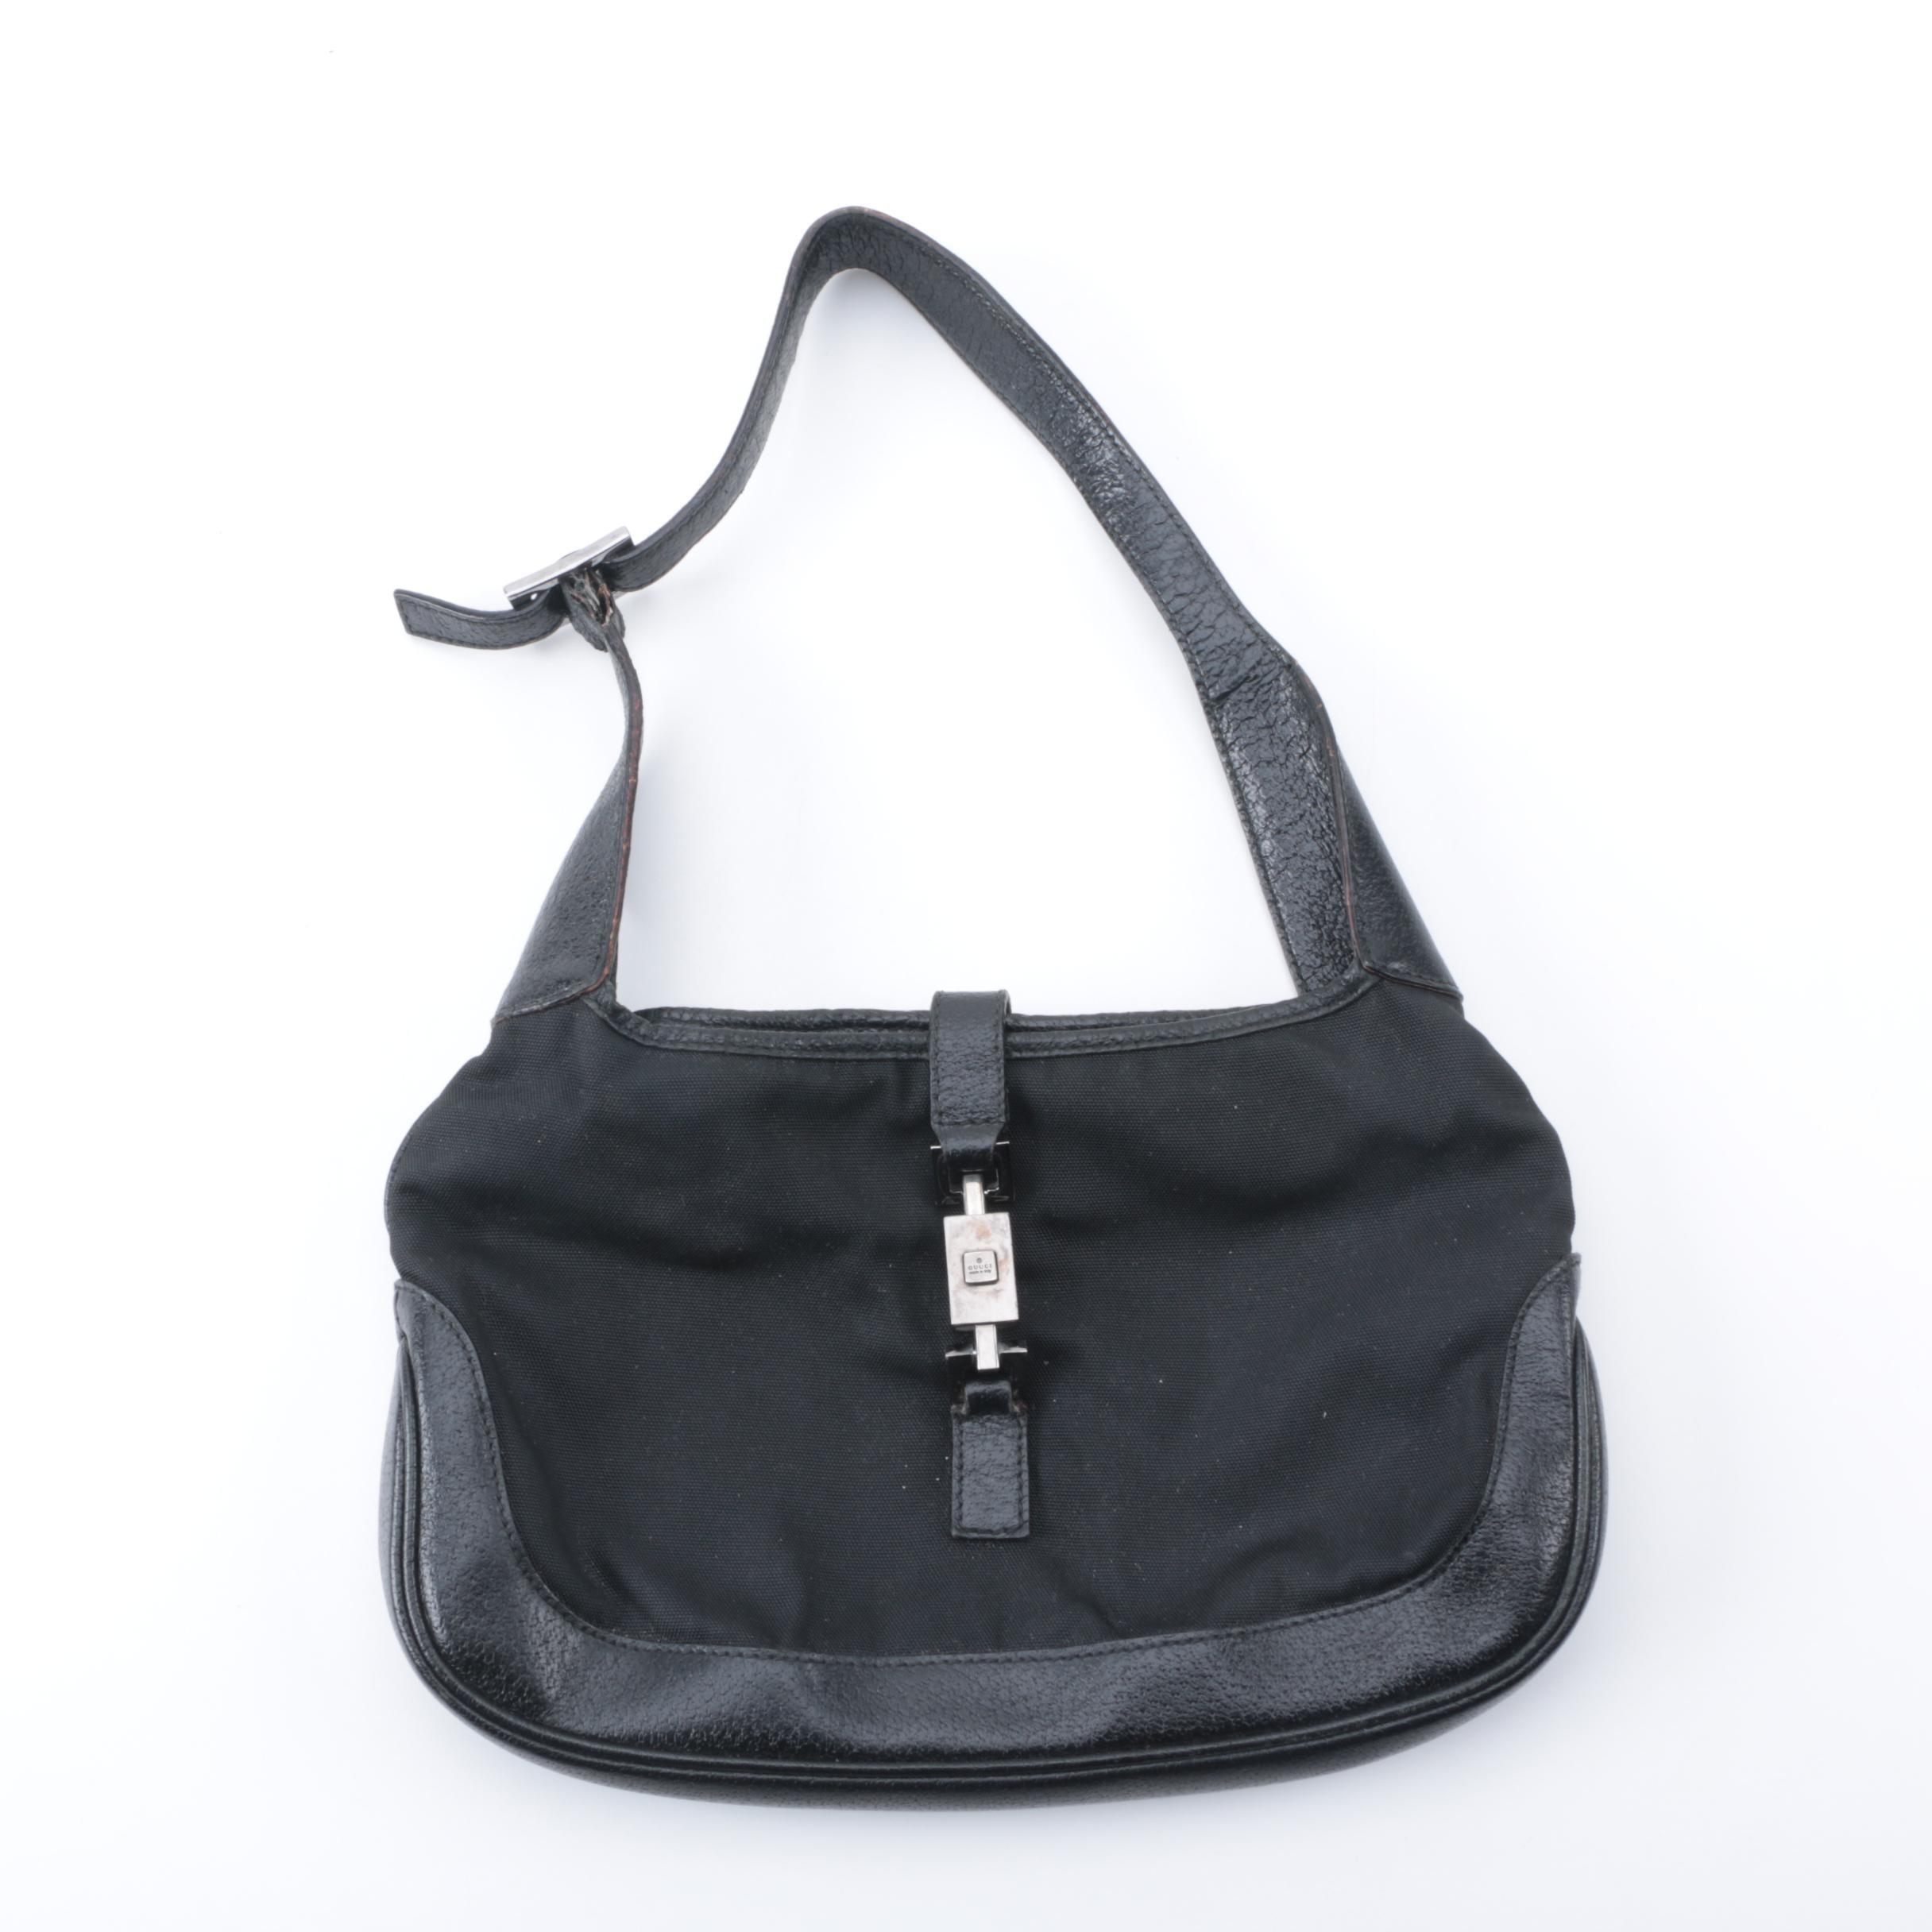 Gucci Black Nylon and Leather Handbag